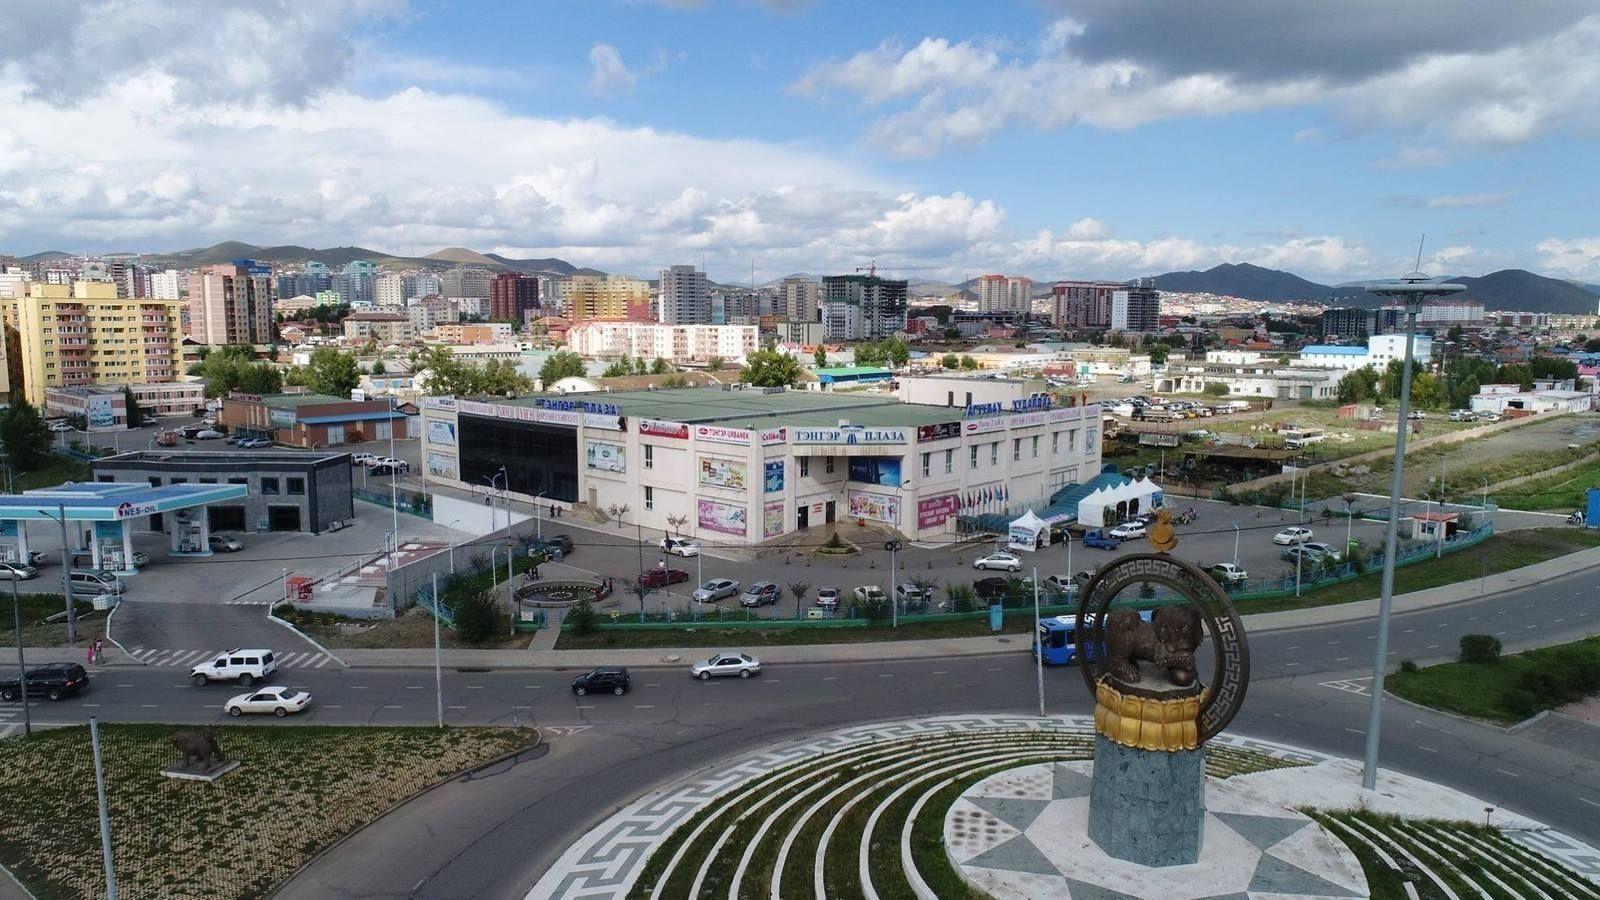 Баянзүрх автовокзалыг Tenger Plaza худалдааны төв рүү шилжүүлж байна